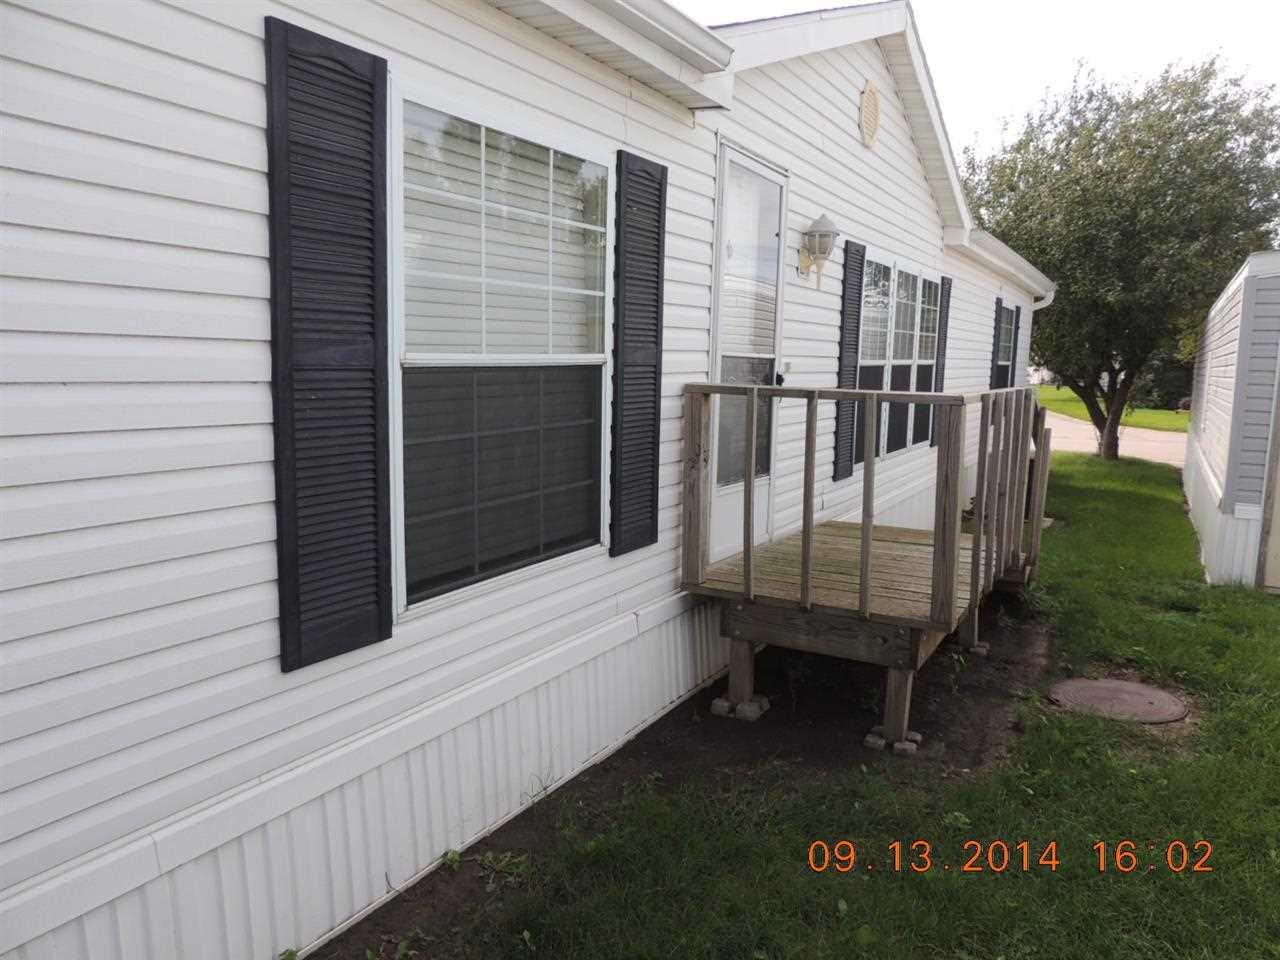 Real Estate for Sale, ListingId: 29932251, Hastings,NE68901